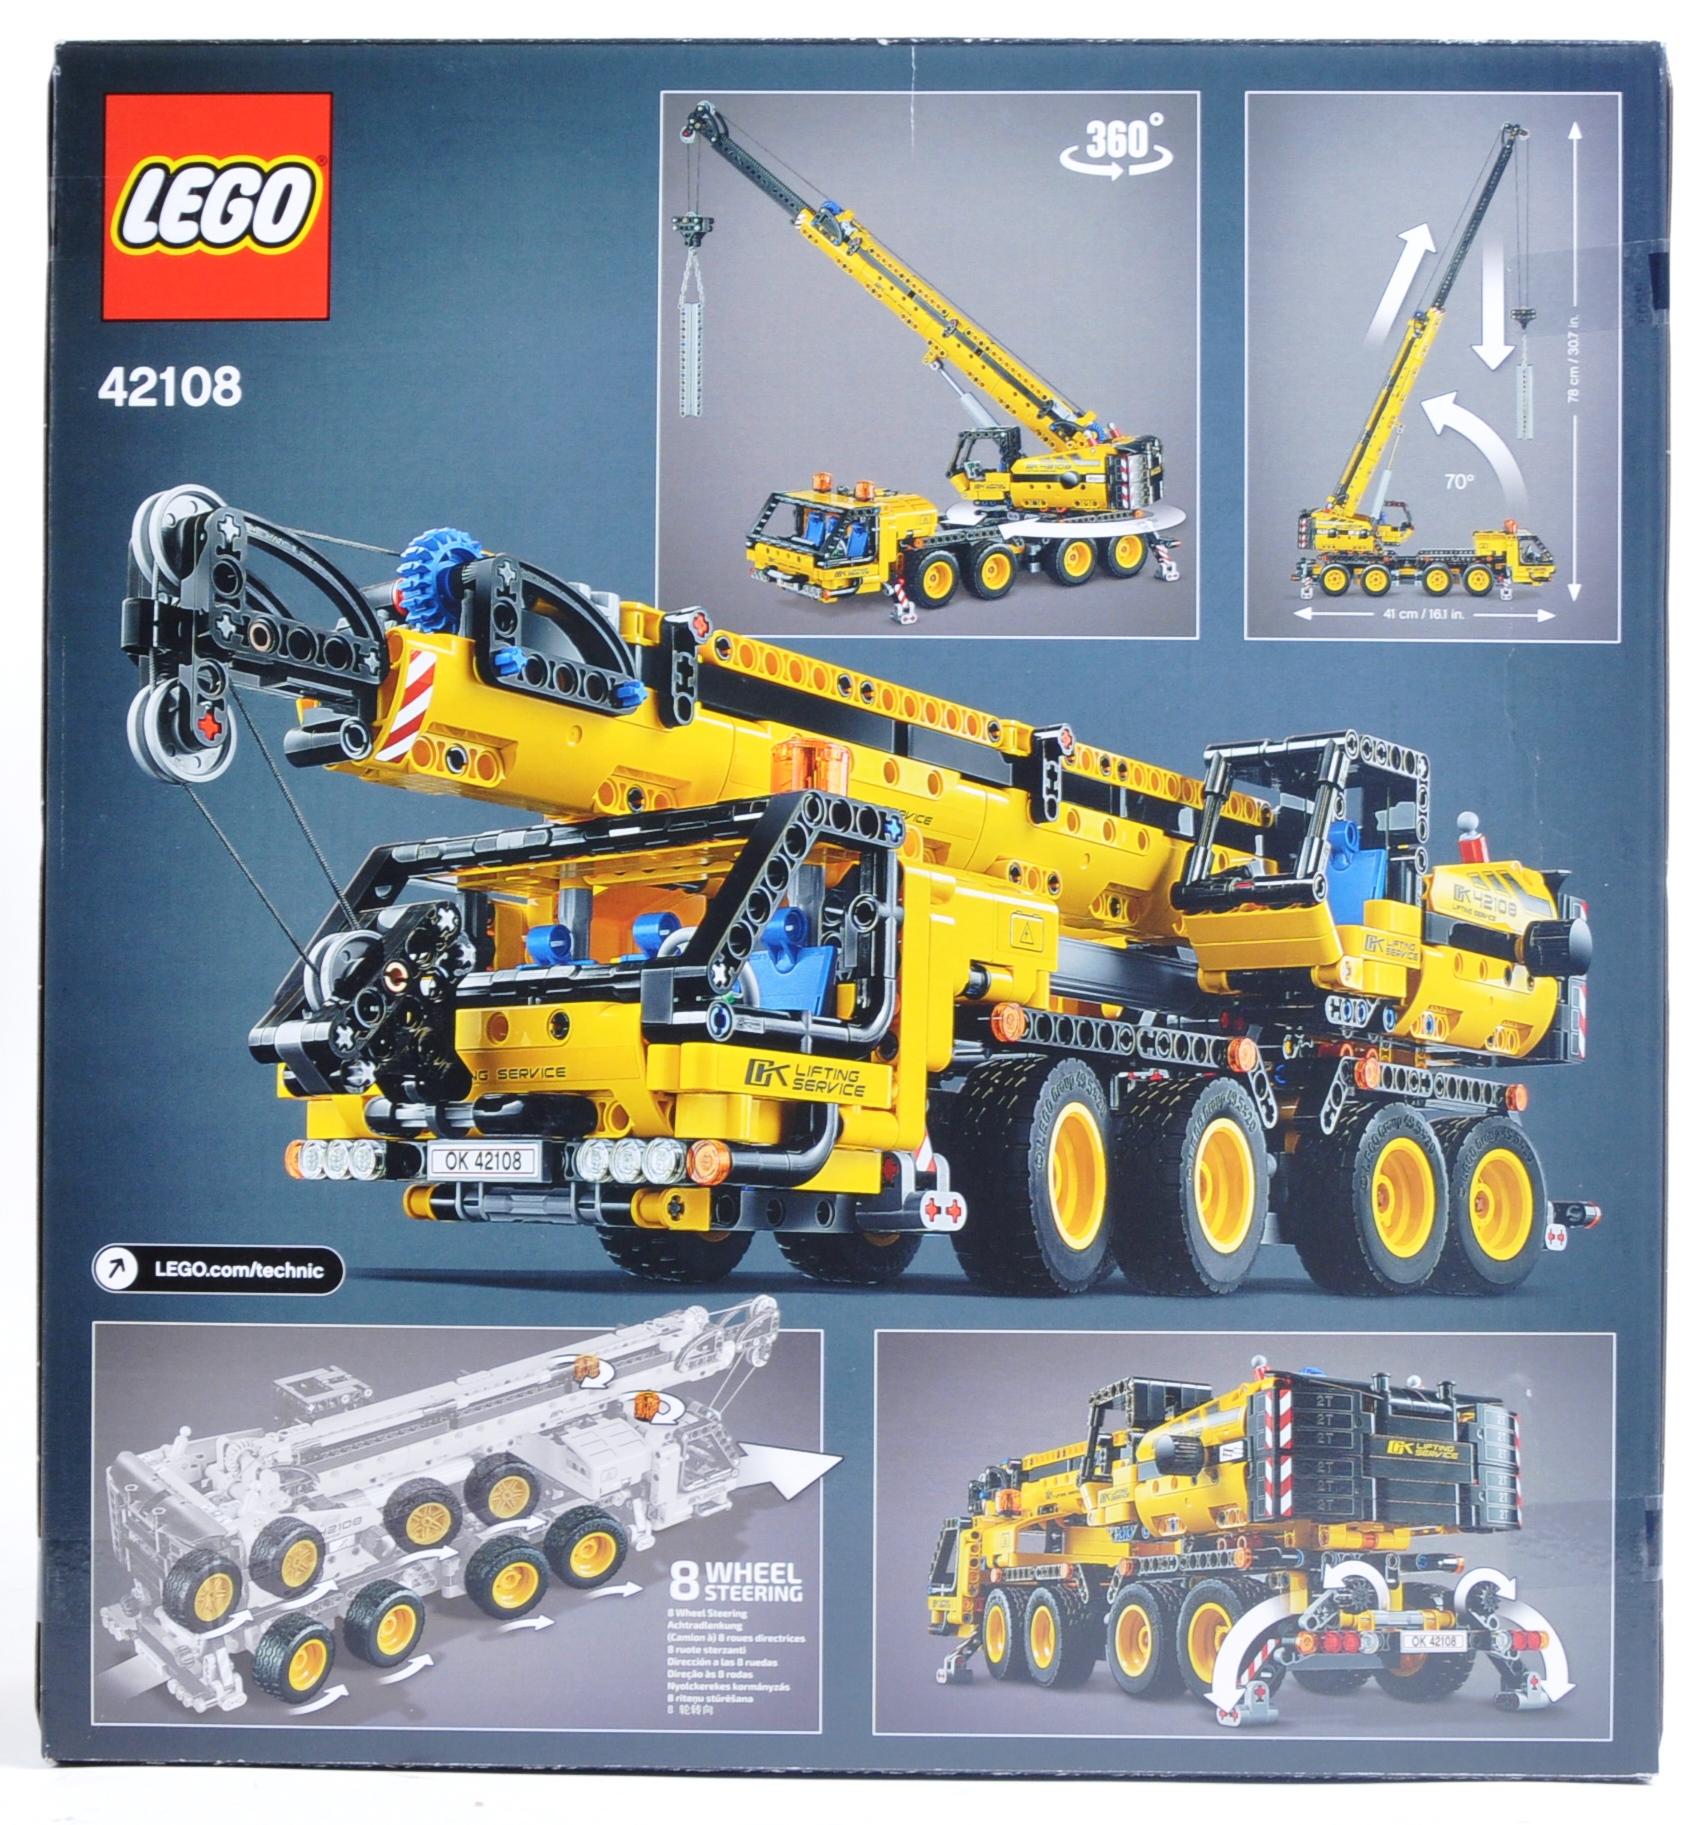 LEGO SET - LEGO TECHNIC - 42108 - MOBILE CRANE - Image 2 of 4